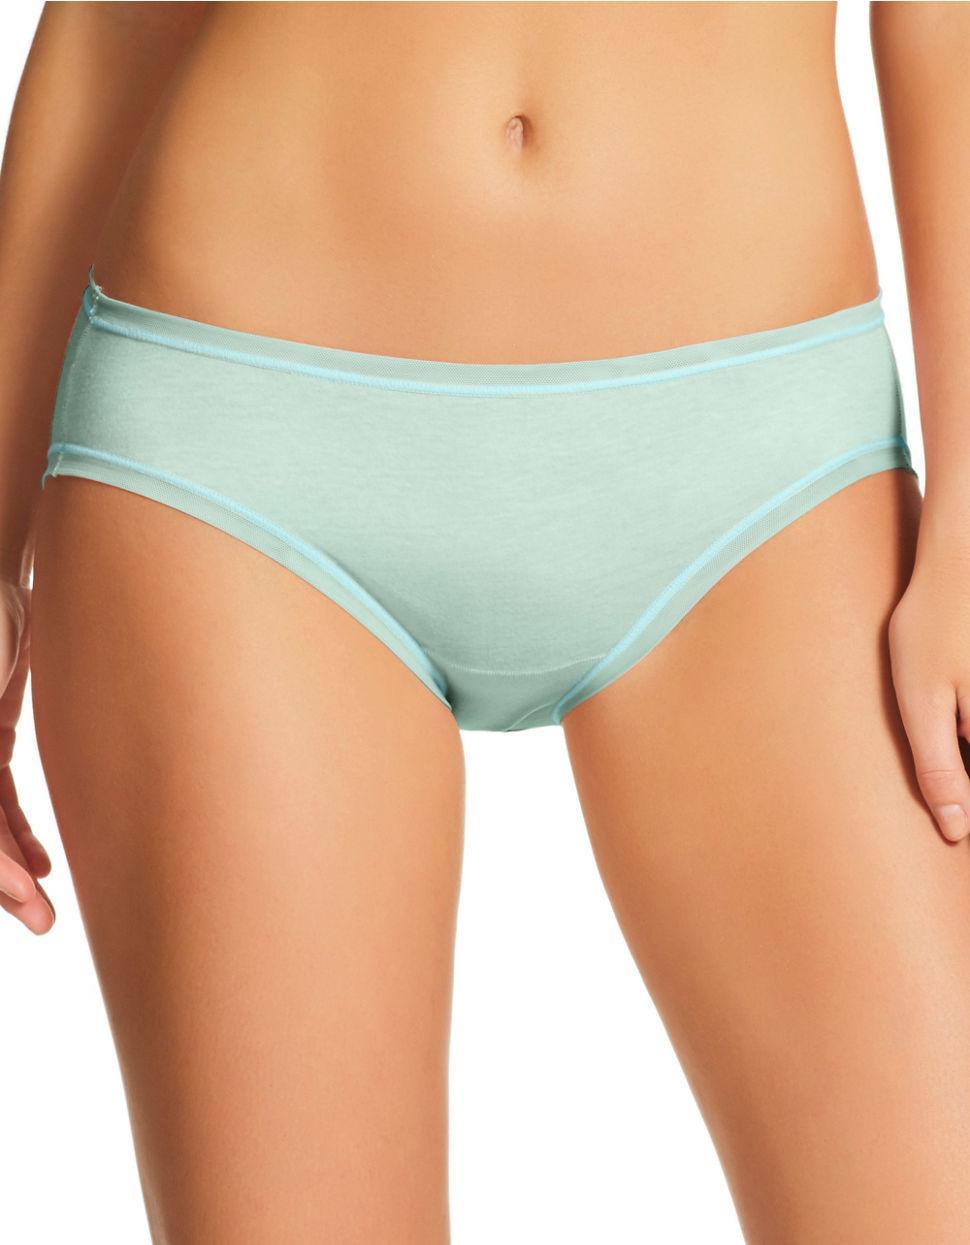 Bikini And Panties 89